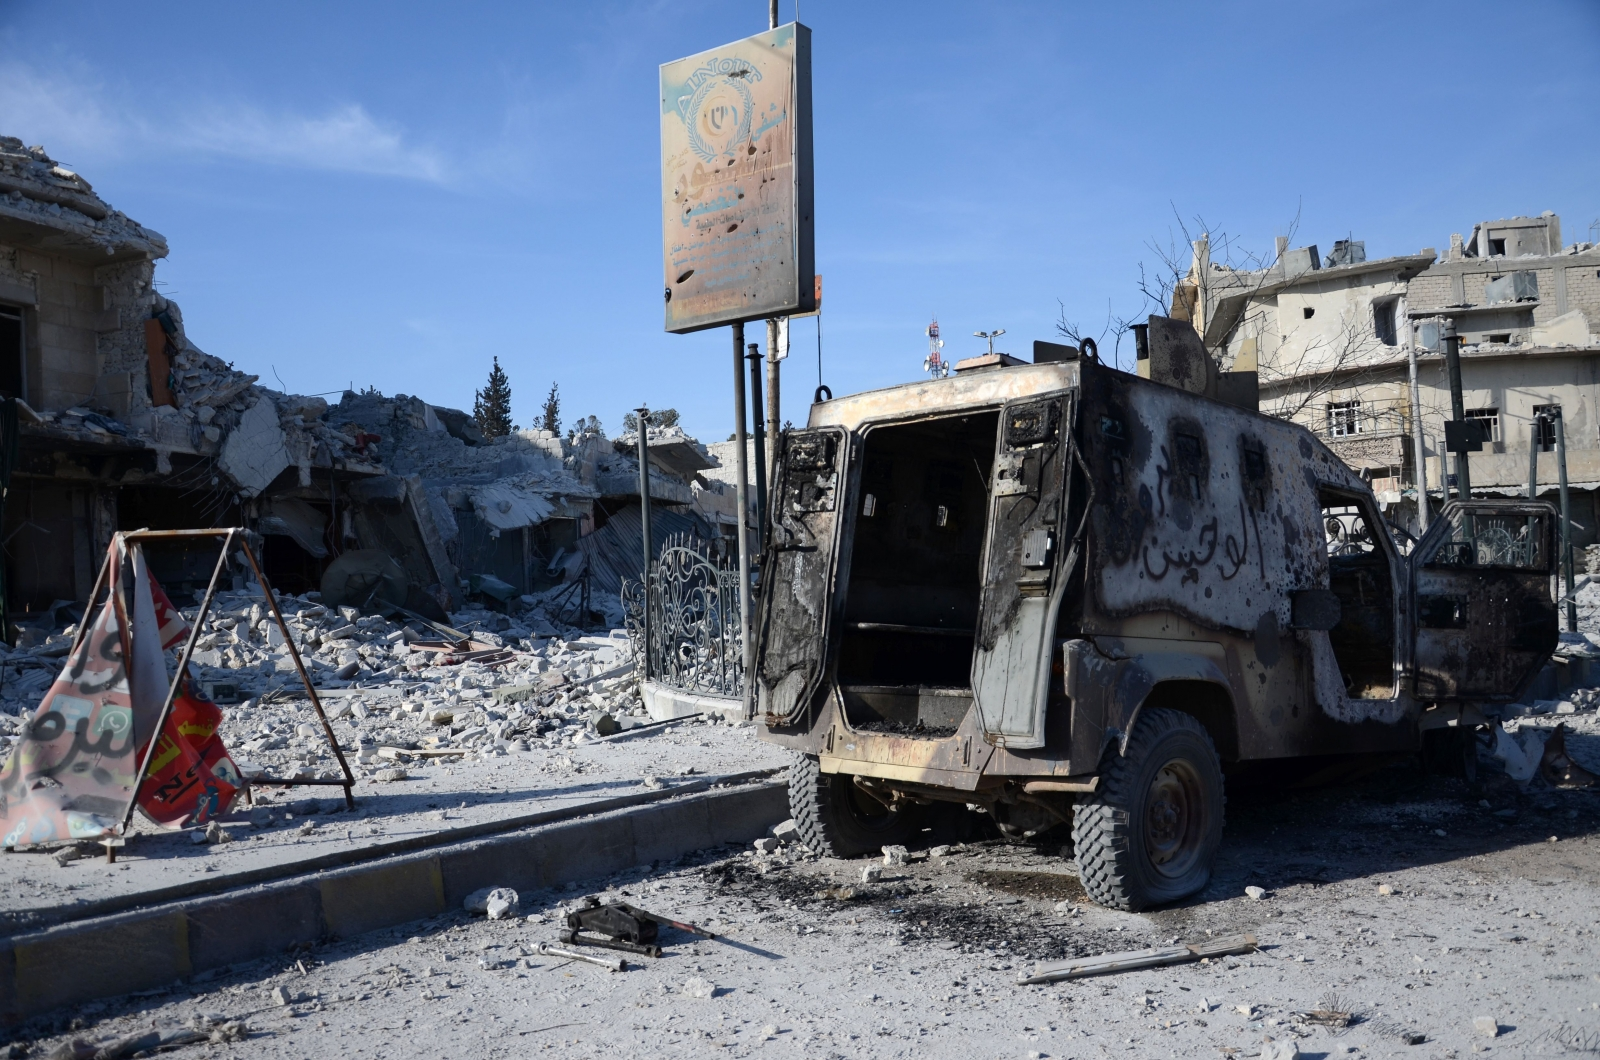 Burnt vehicle in al-Bab